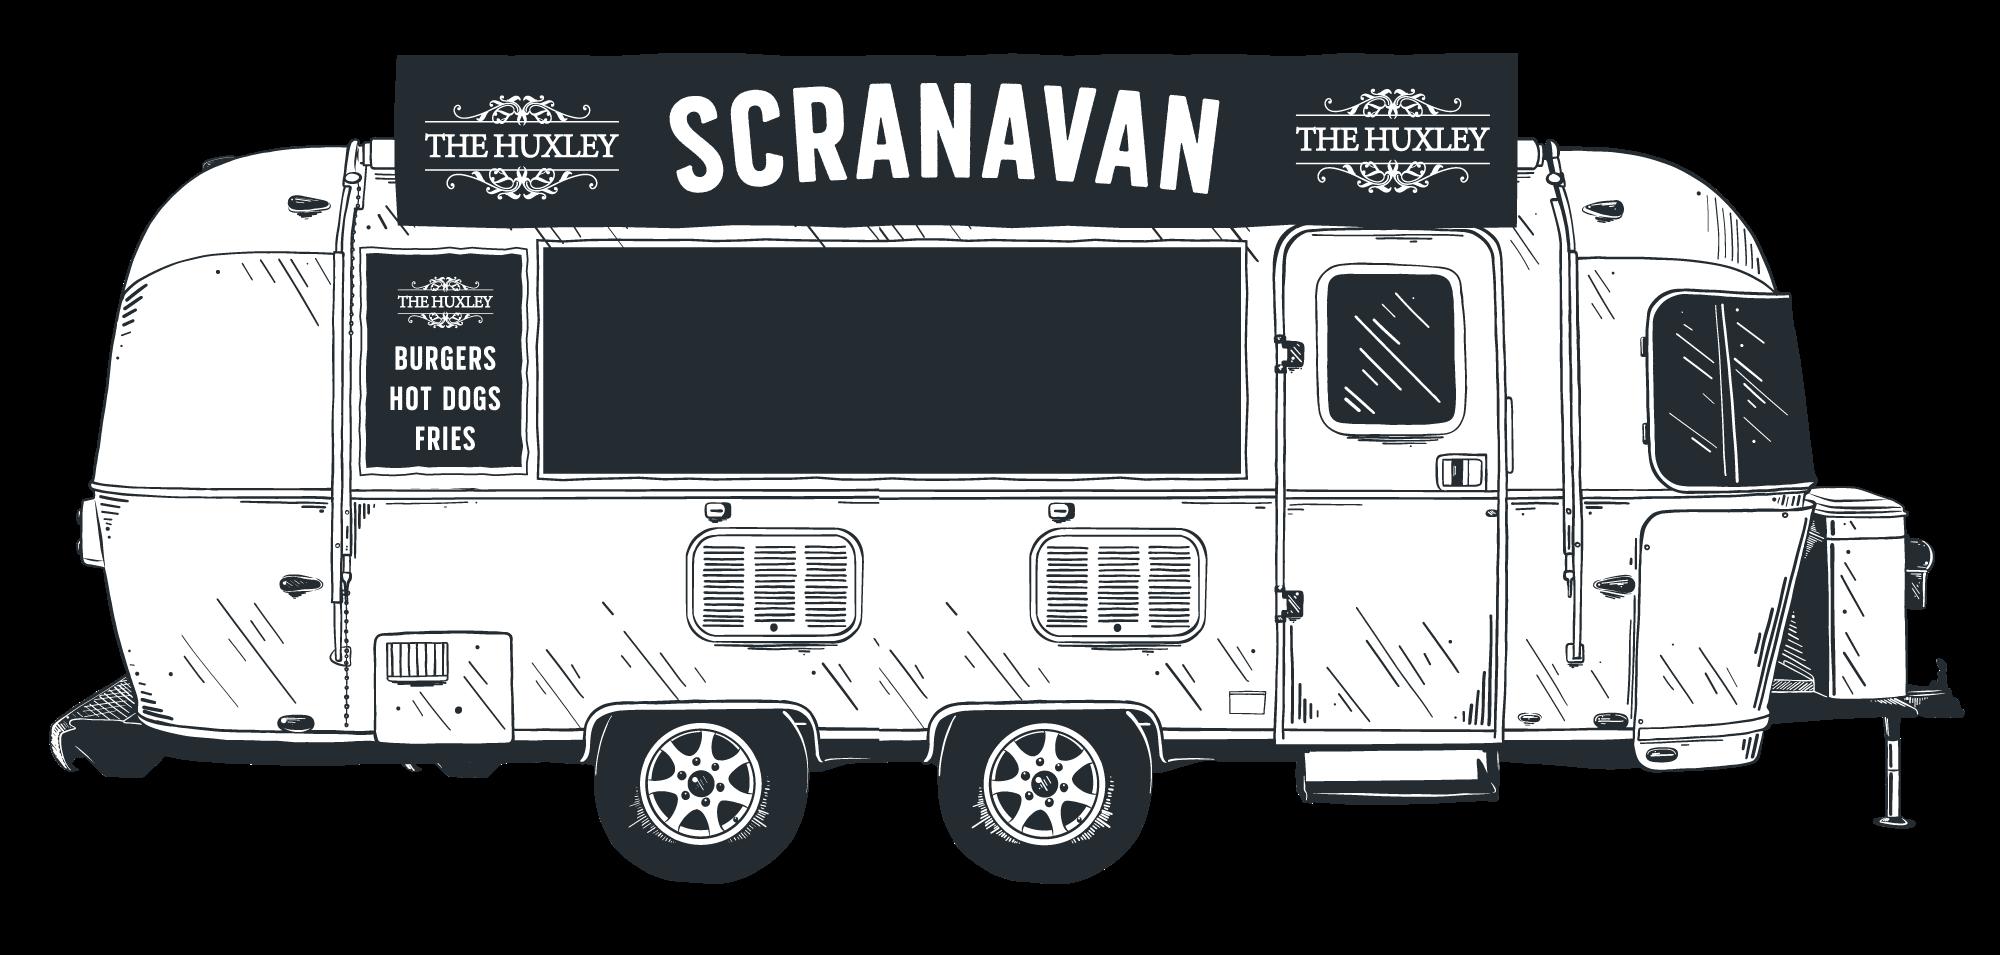 Huxley Scranavan